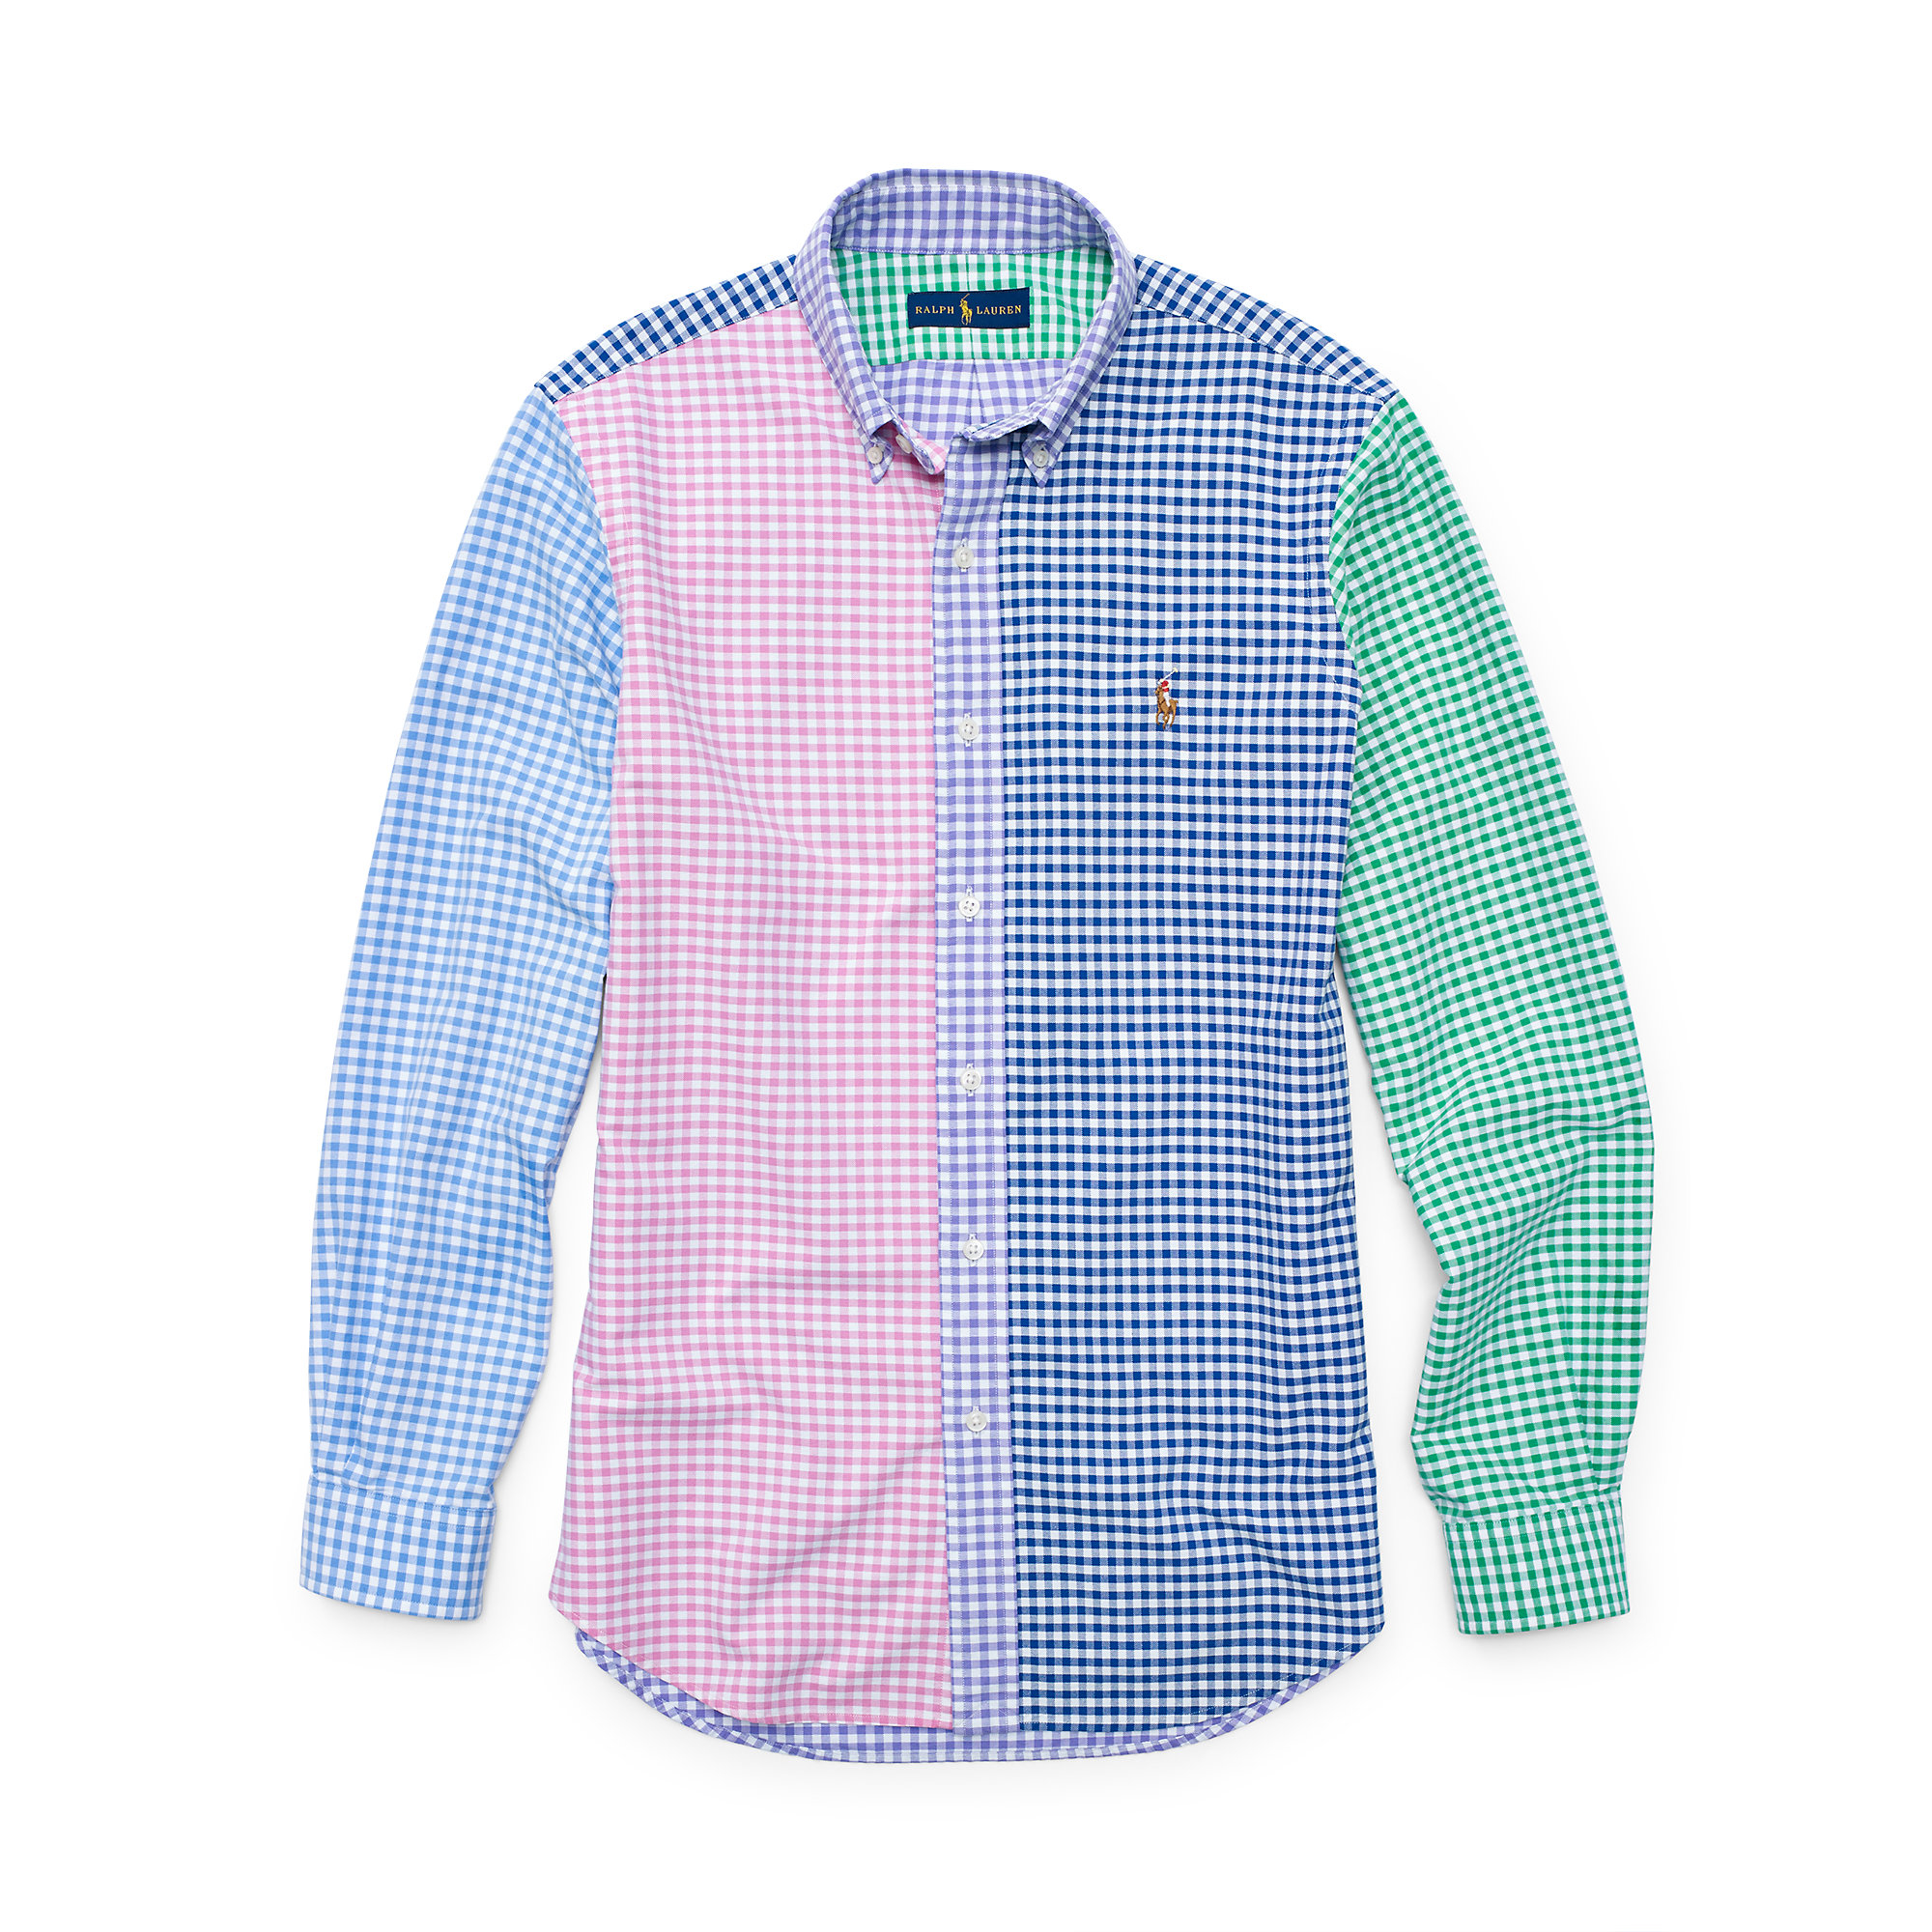 03400f11eae0 ... closeout lyst polo ralph lauren fun oxford sport shirt for men c8afd  5fc80